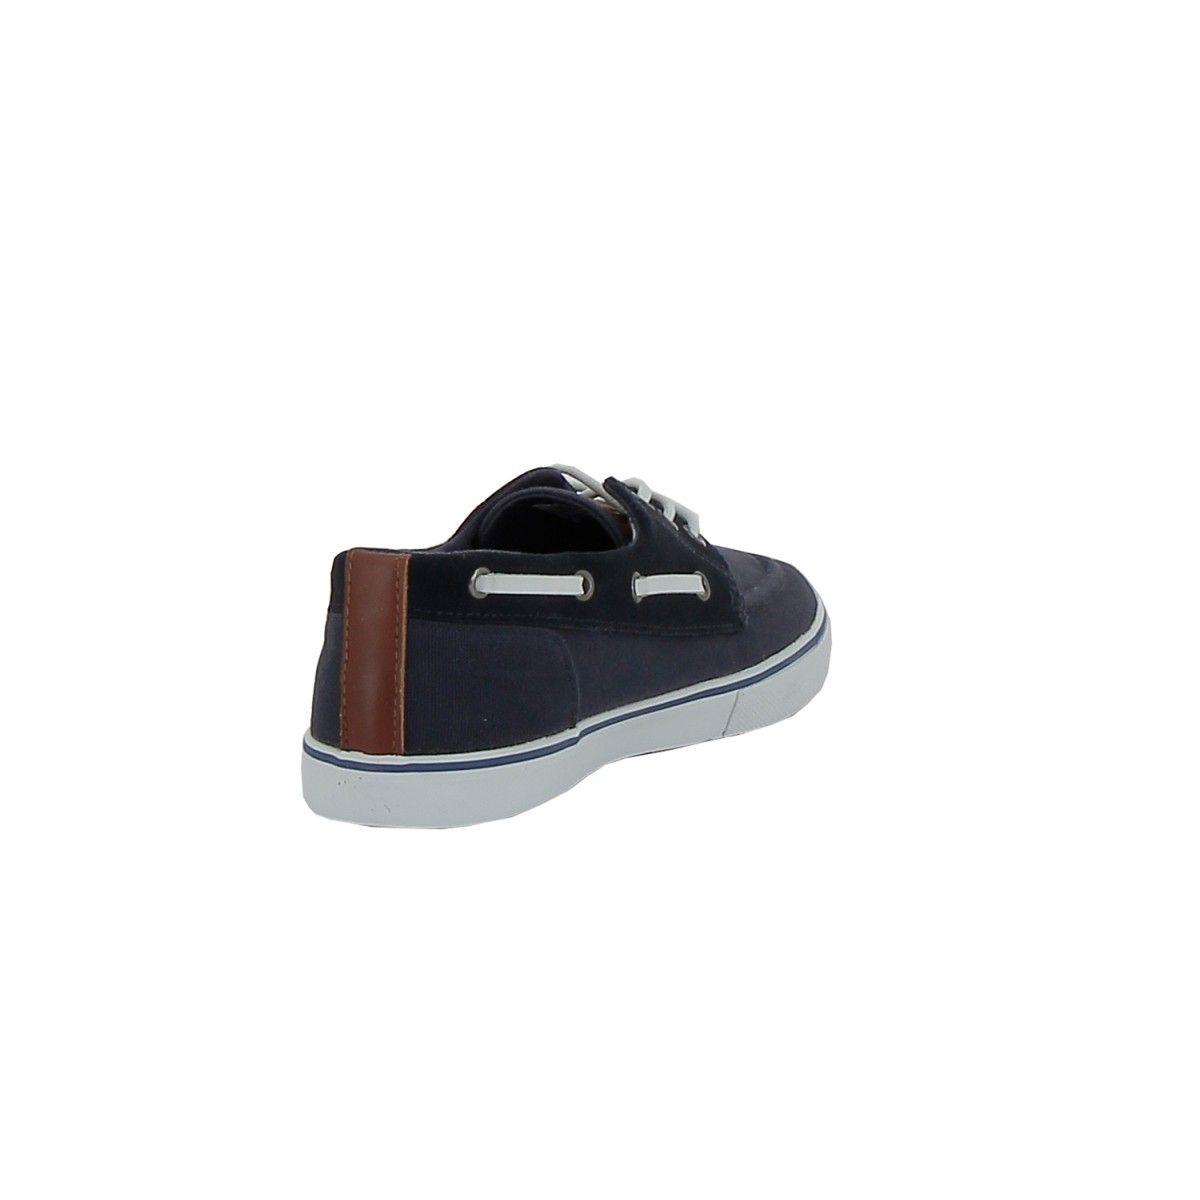 Chaussure bateau hugo boss junior - j29132-849 bleu Hugo Boss 8276e1979101